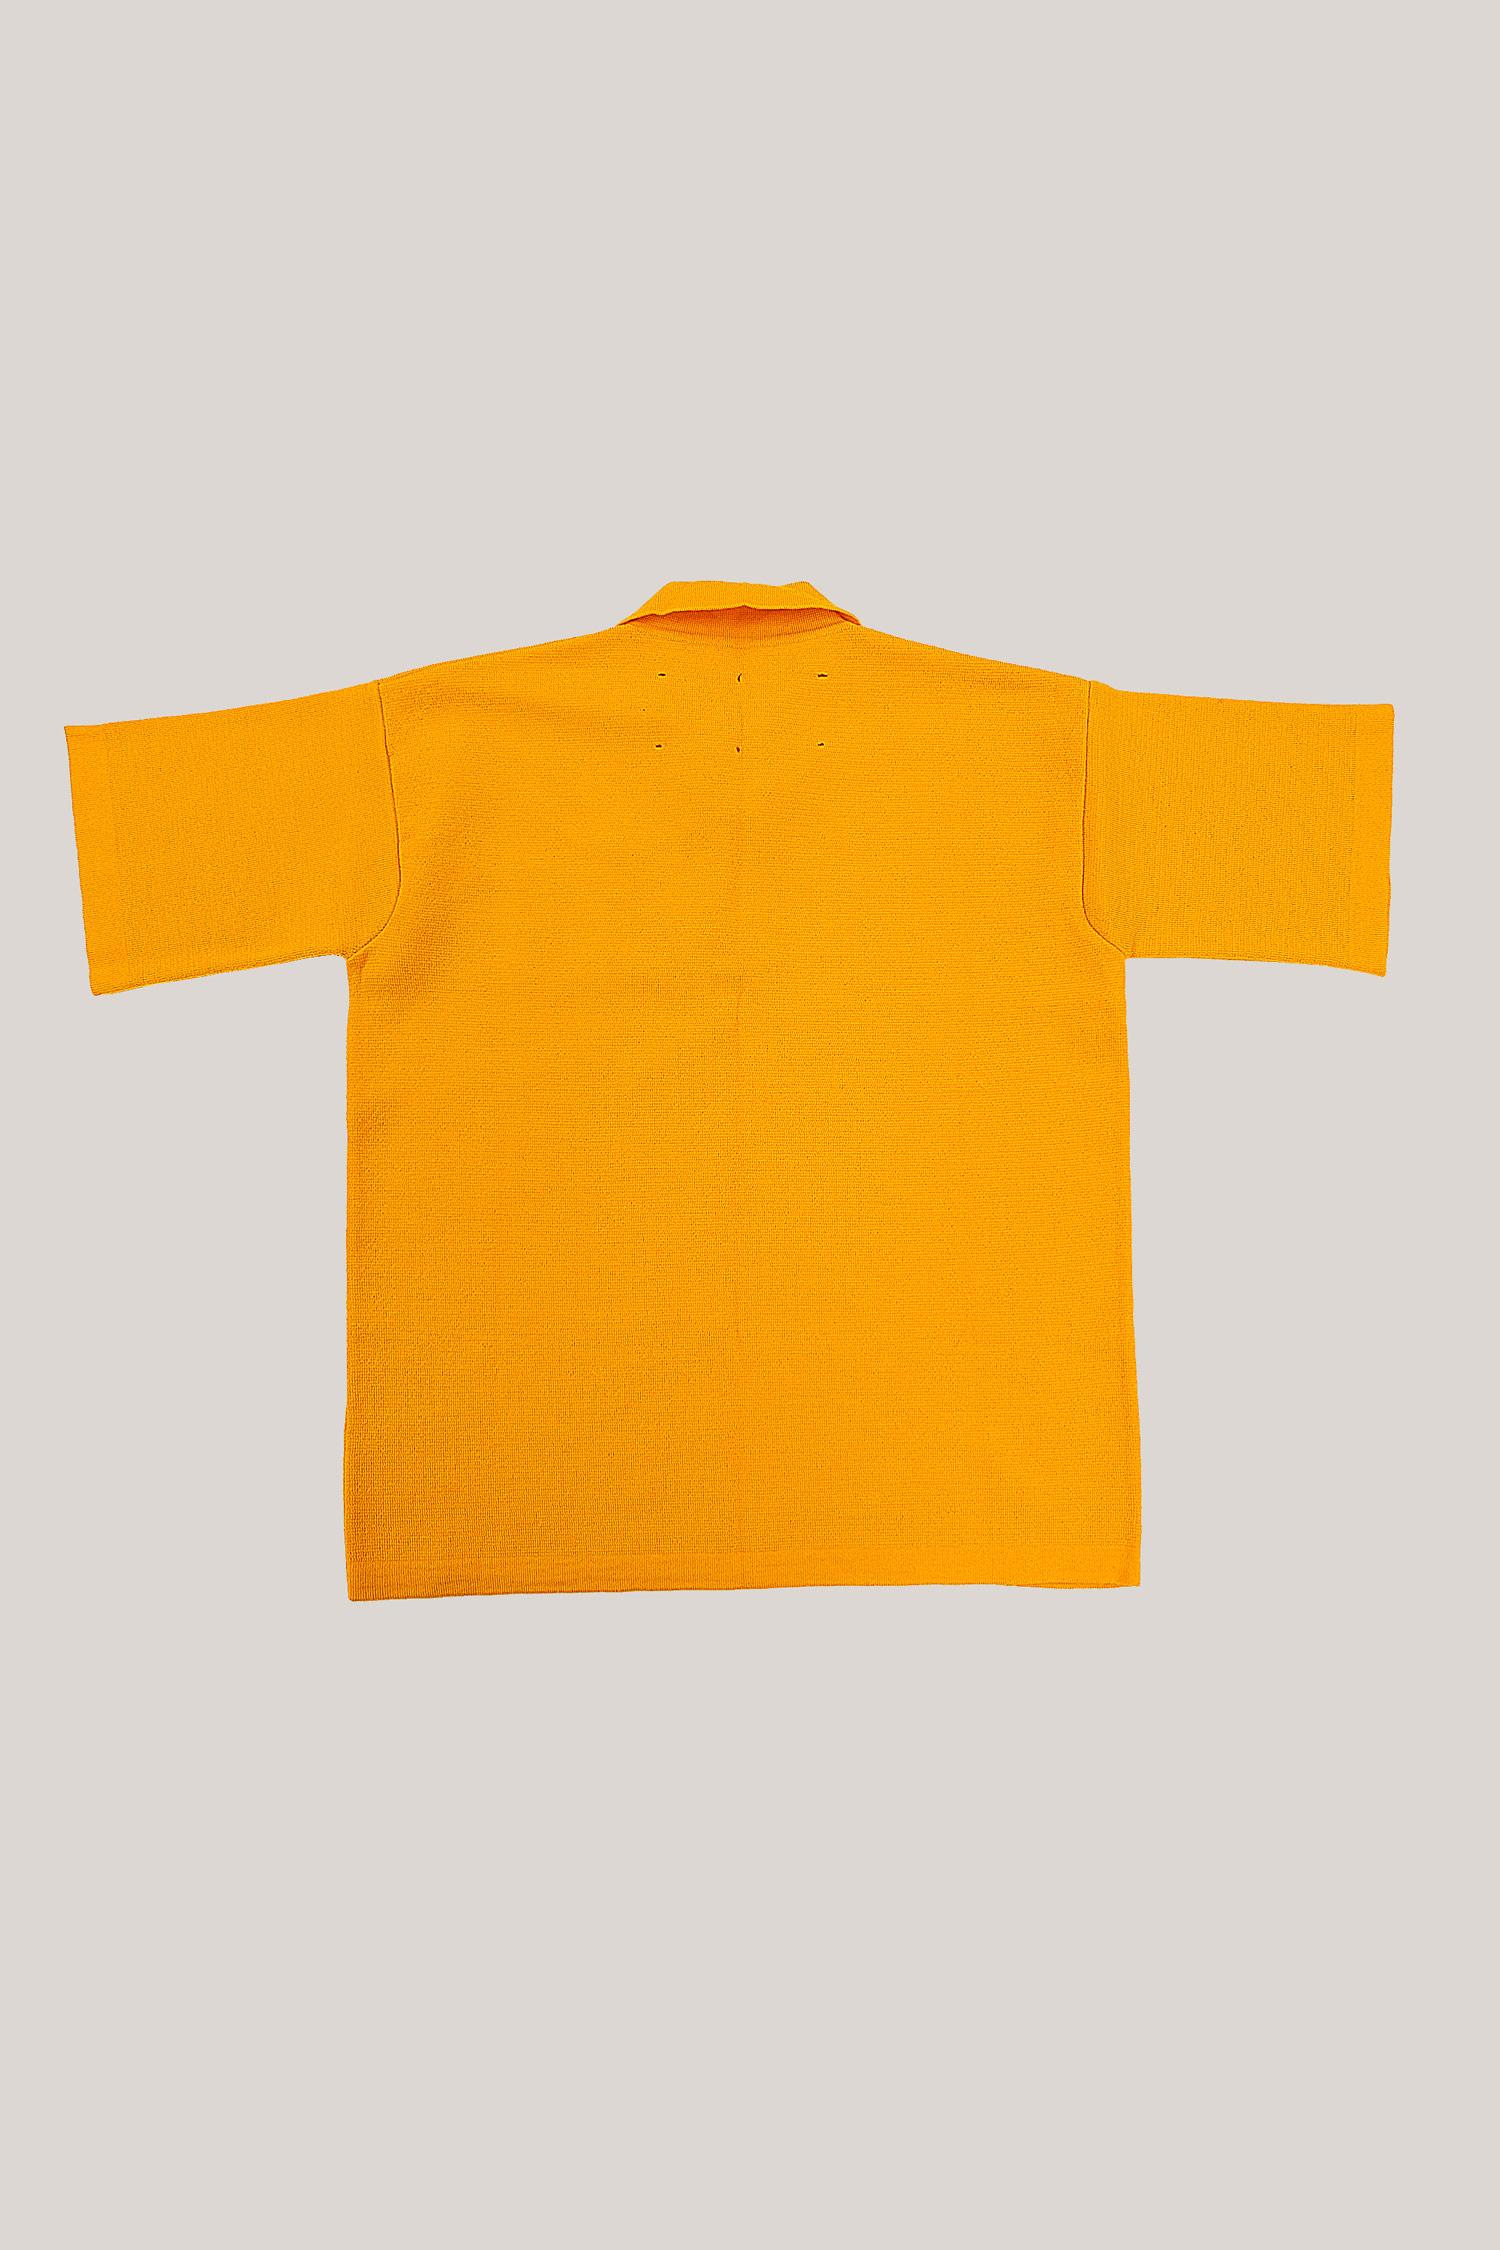 38-Knitted-tshirt-orange-2